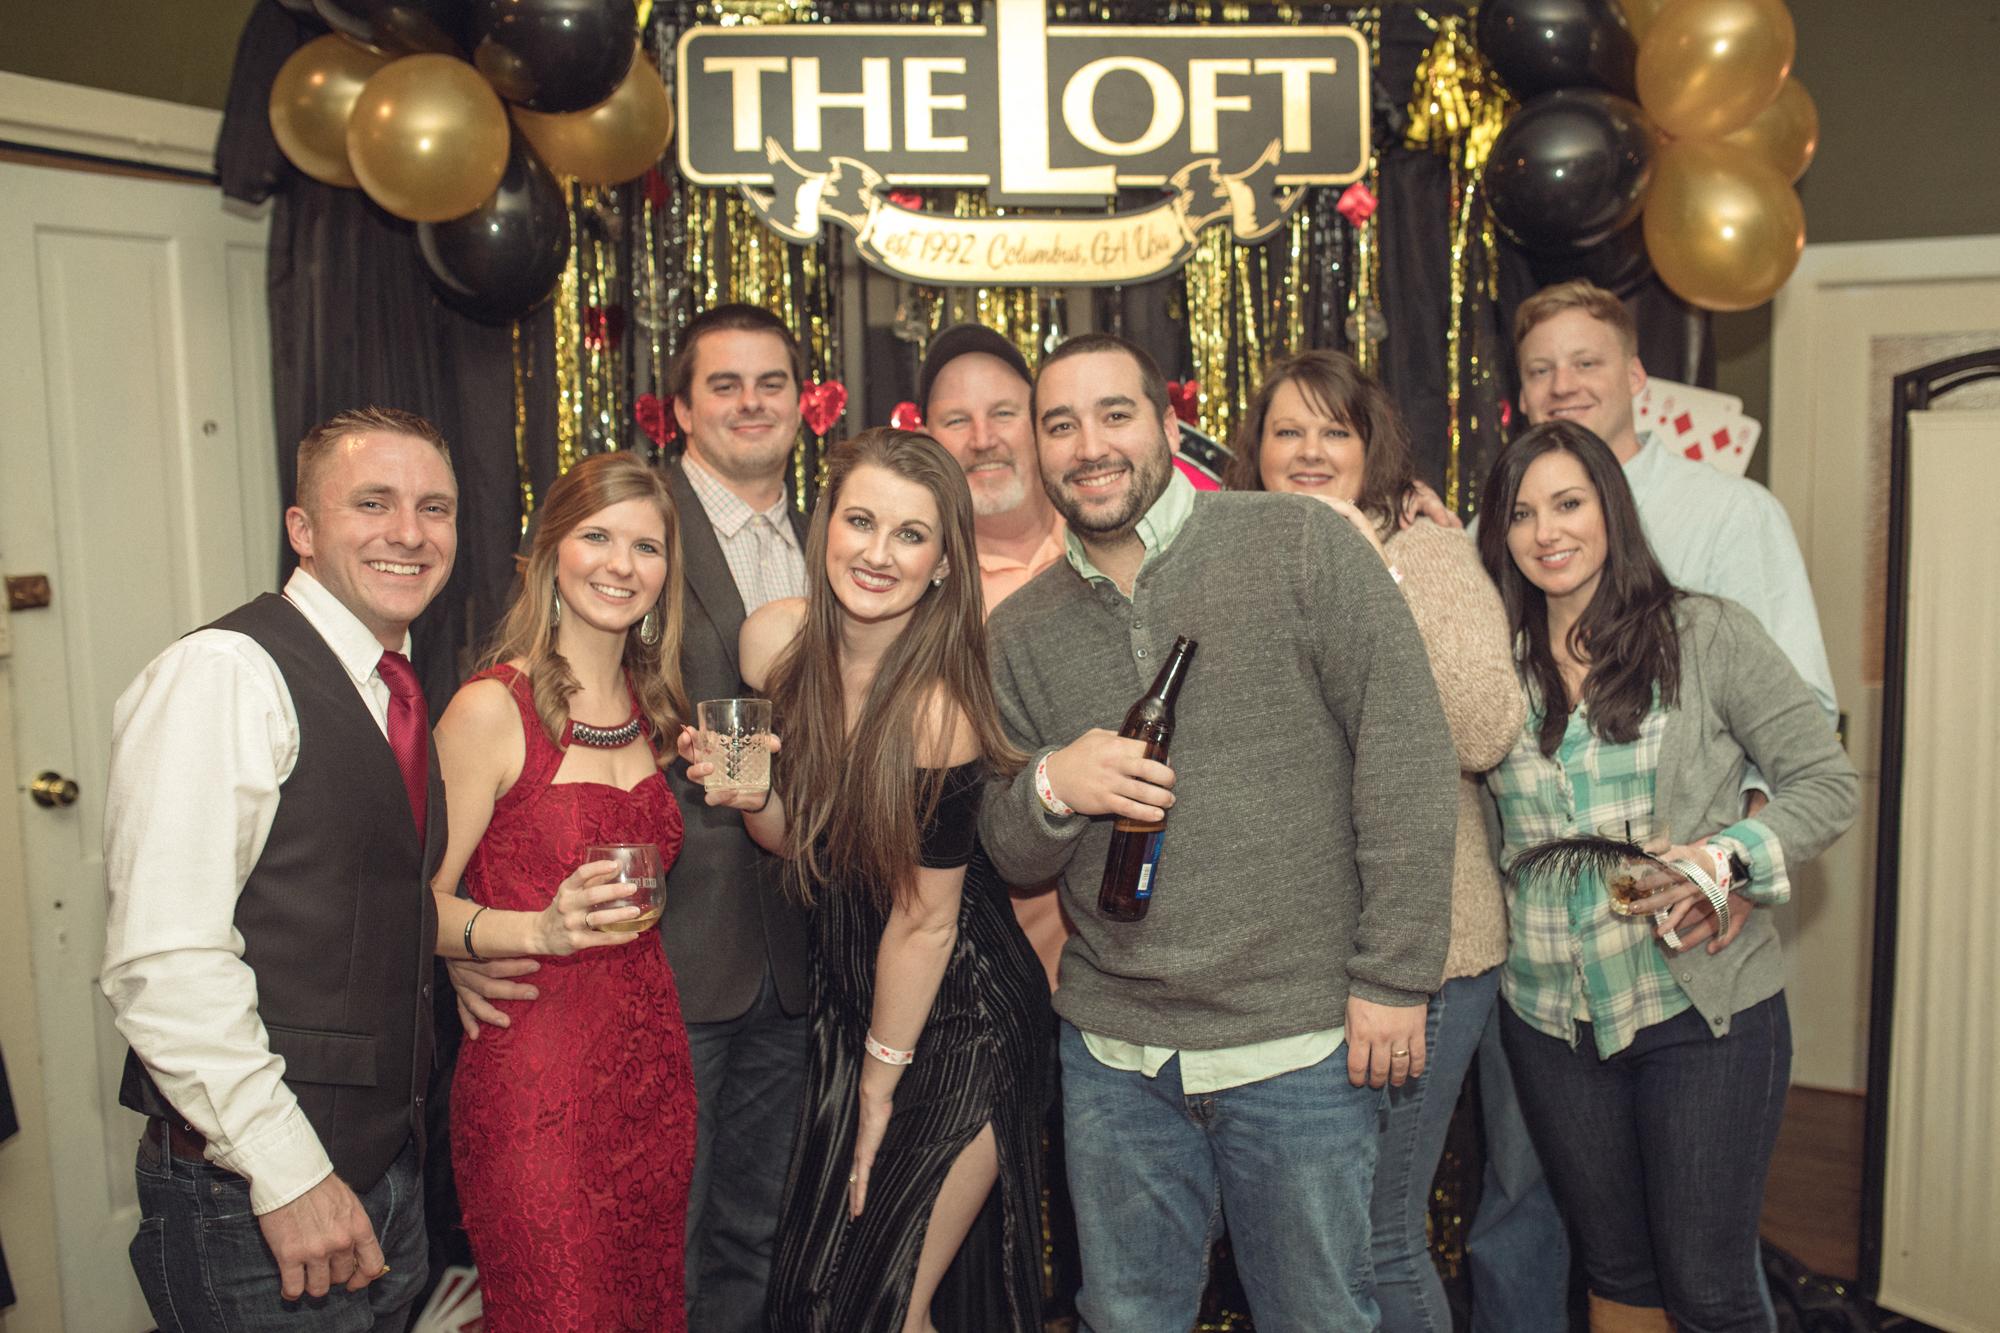 Loft new years-32.jpg